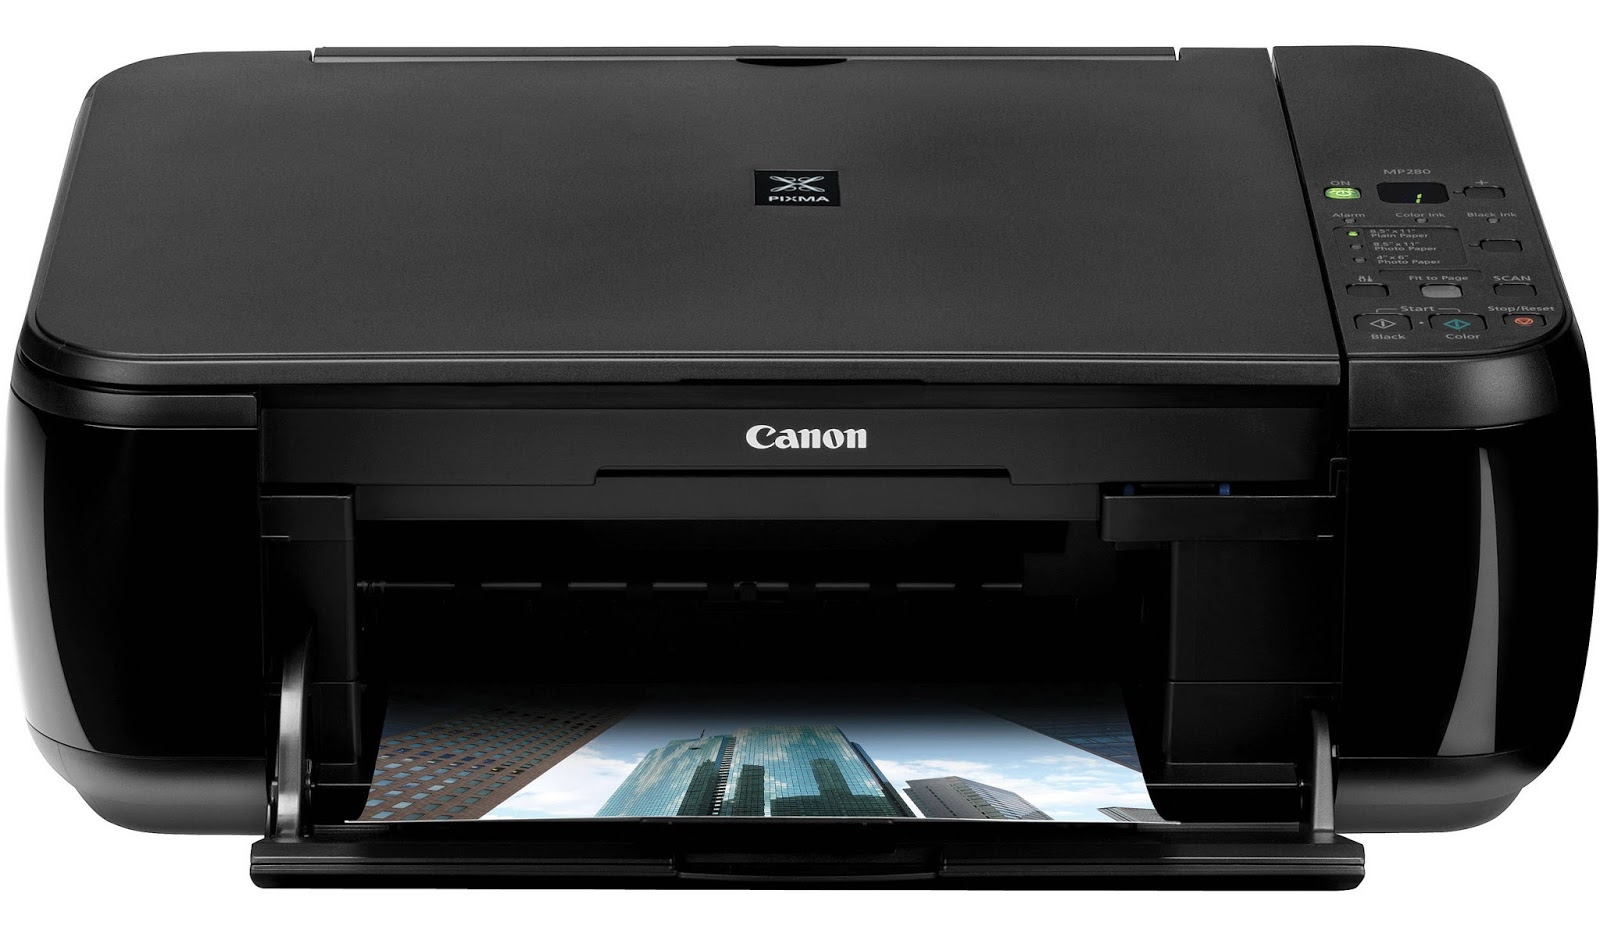 Canon Mp280 Drivers Download Windows 10